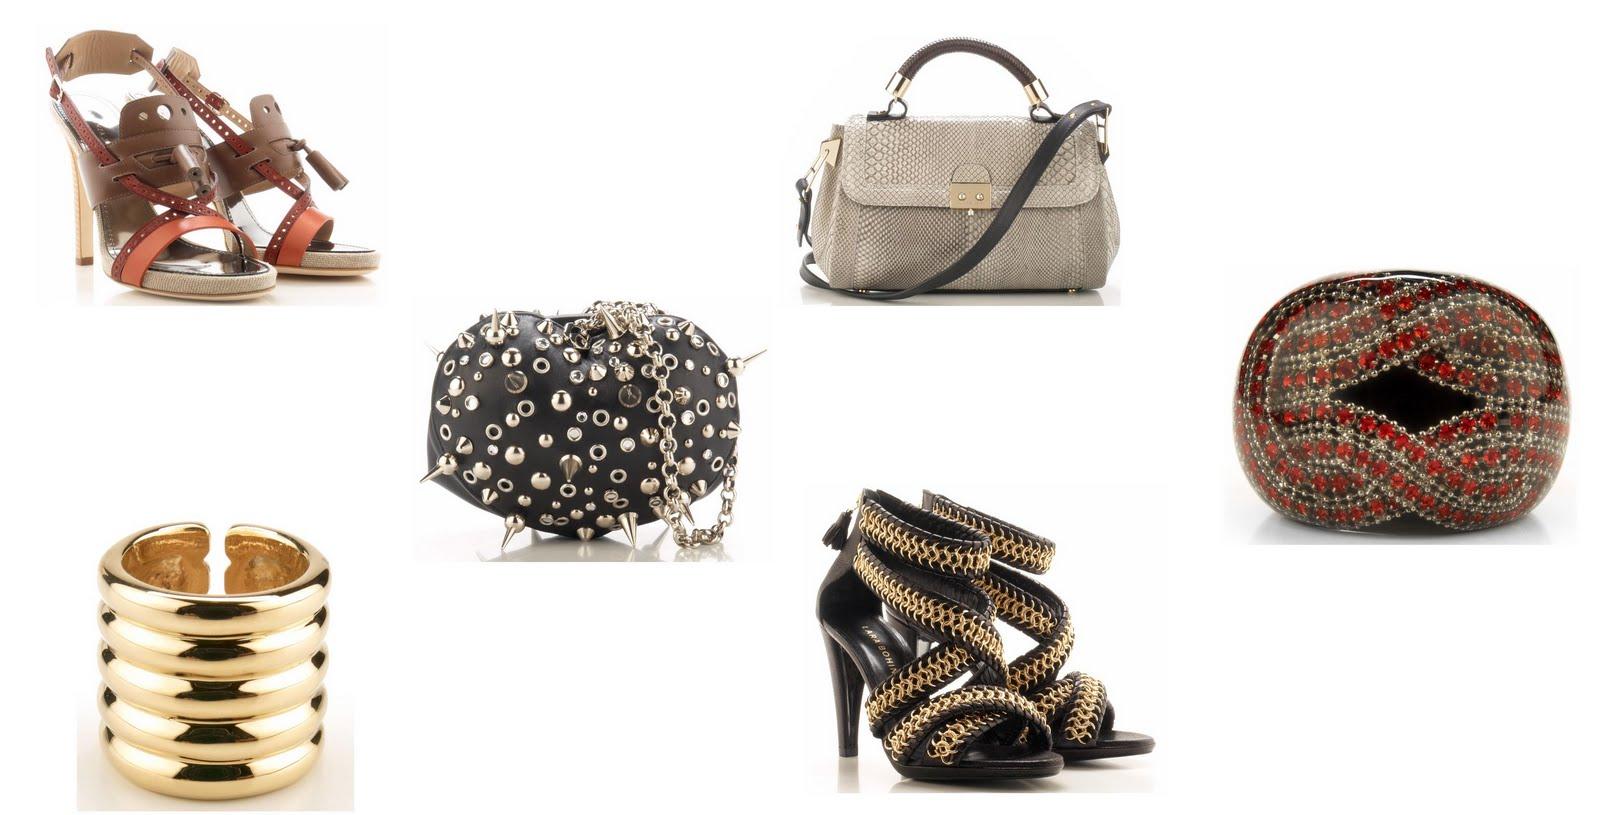 http://4.bp.blogspot.com/-civyA9-VDPk/TxYB5Rdi1yI/AAAAAAAAFDA/OJ-L791skK8/s1600/The+Luxury+Emporium.jpg